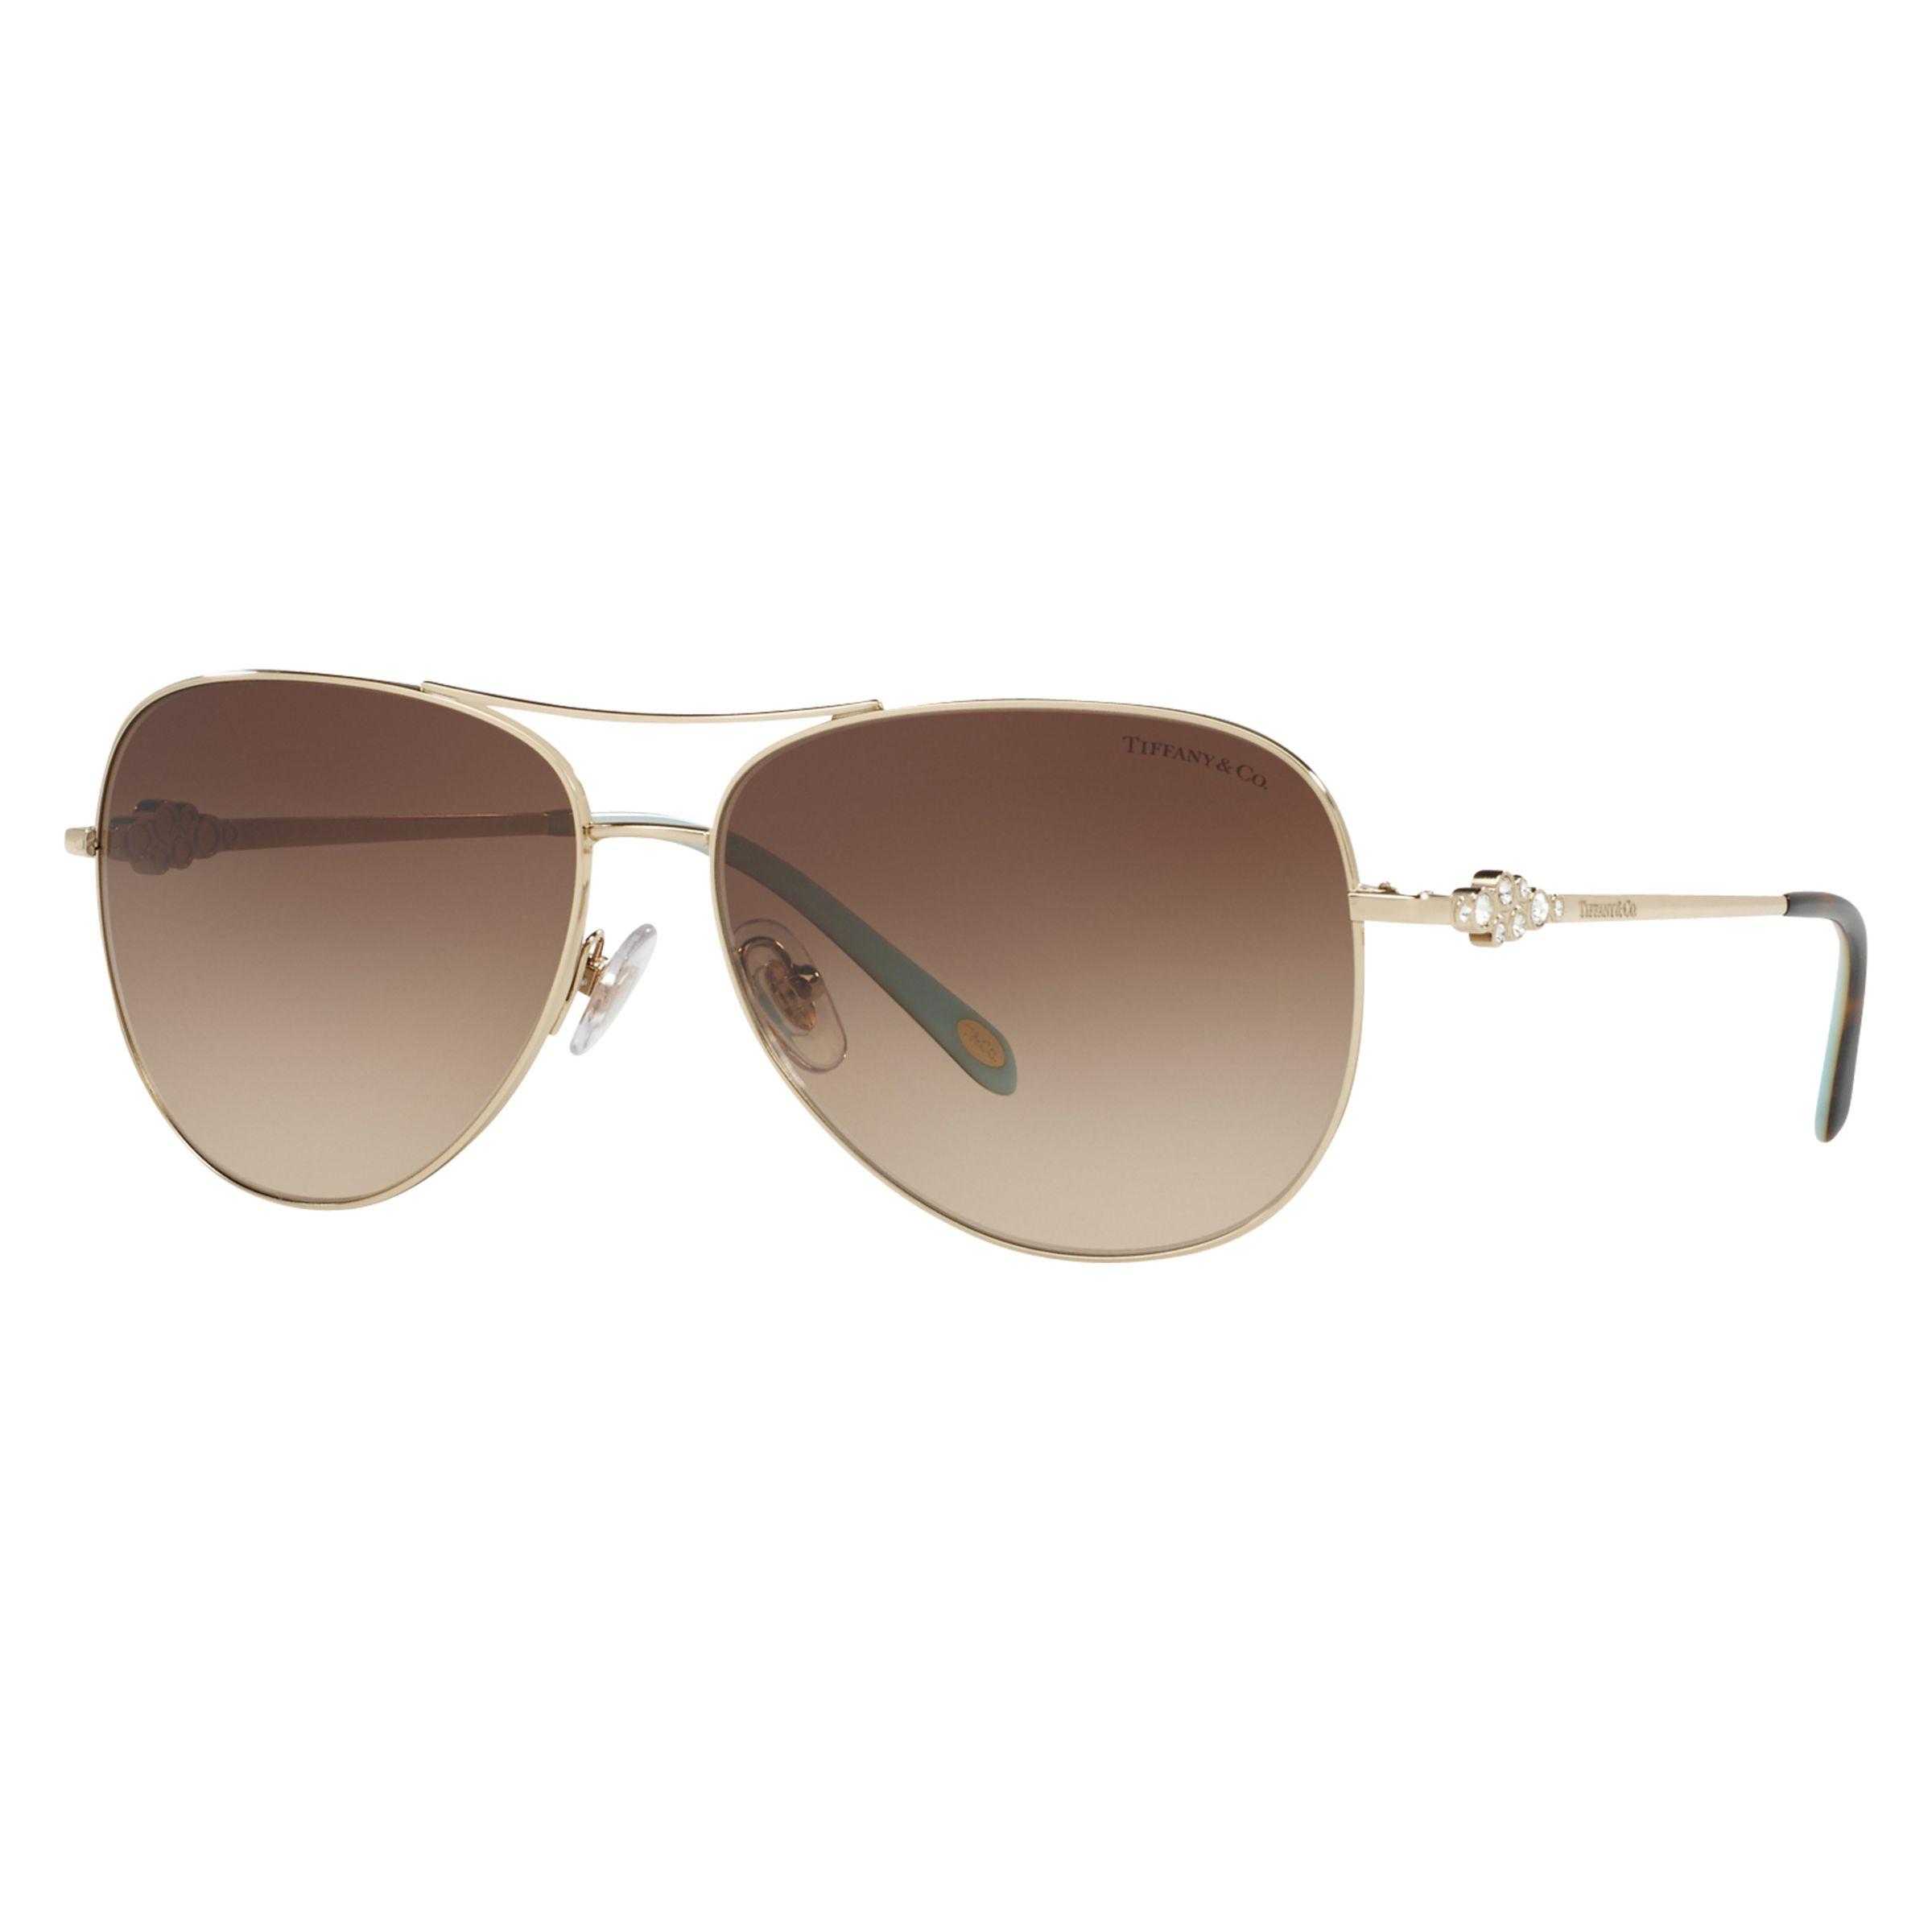 Tiffany & Co Tiffany & Co TF3052B Aviator Sunglasses, Gold/Brown